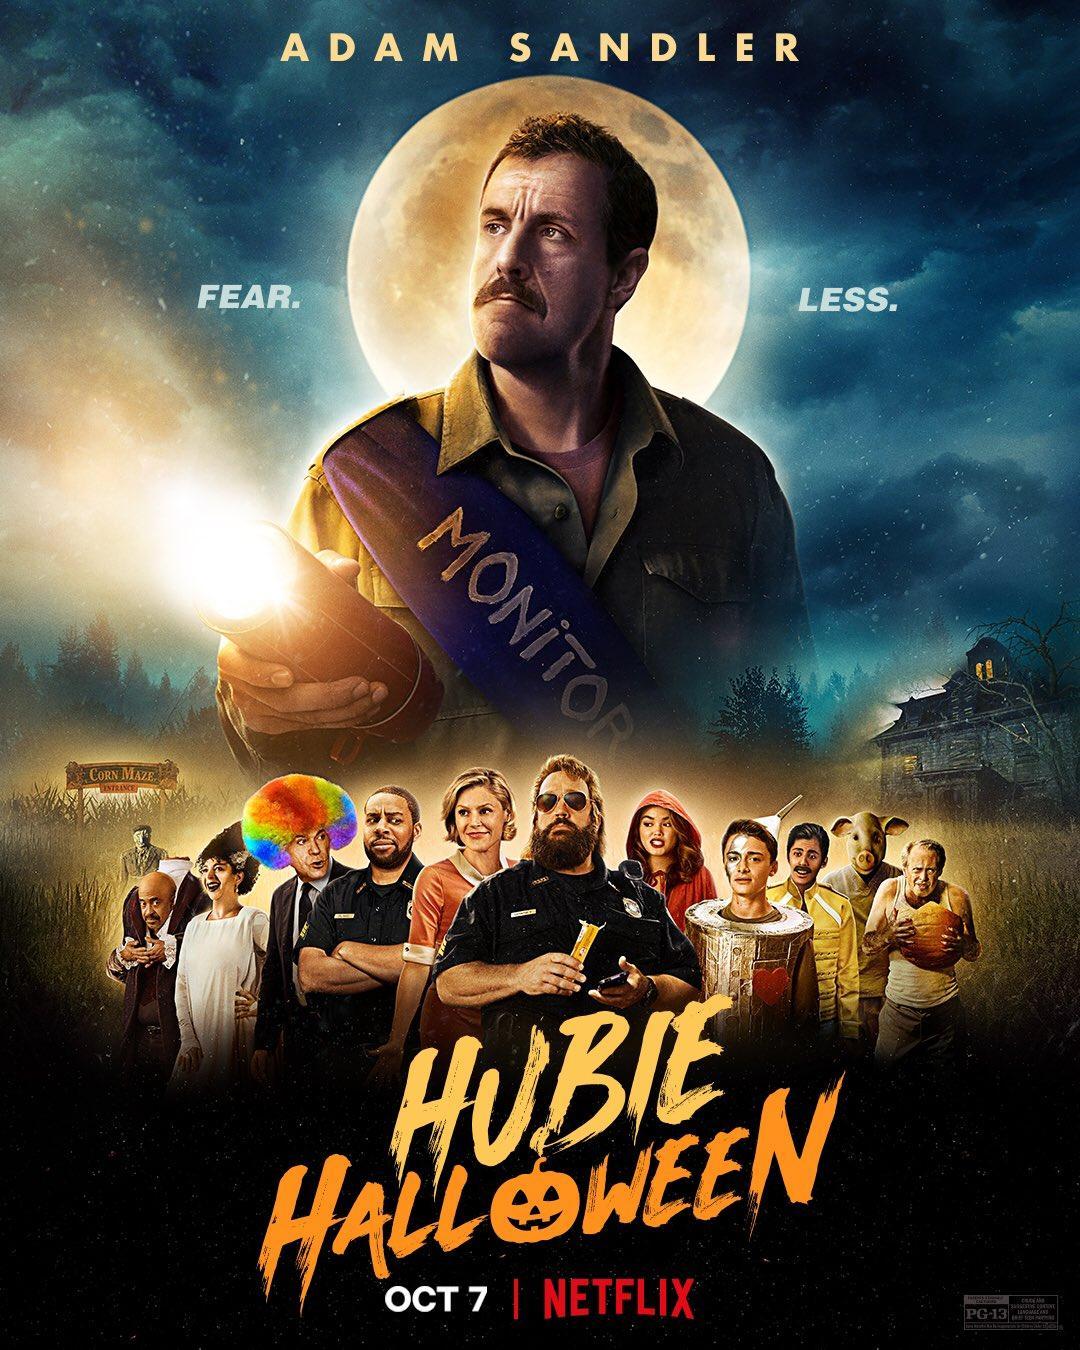 10. Hubie Halloween